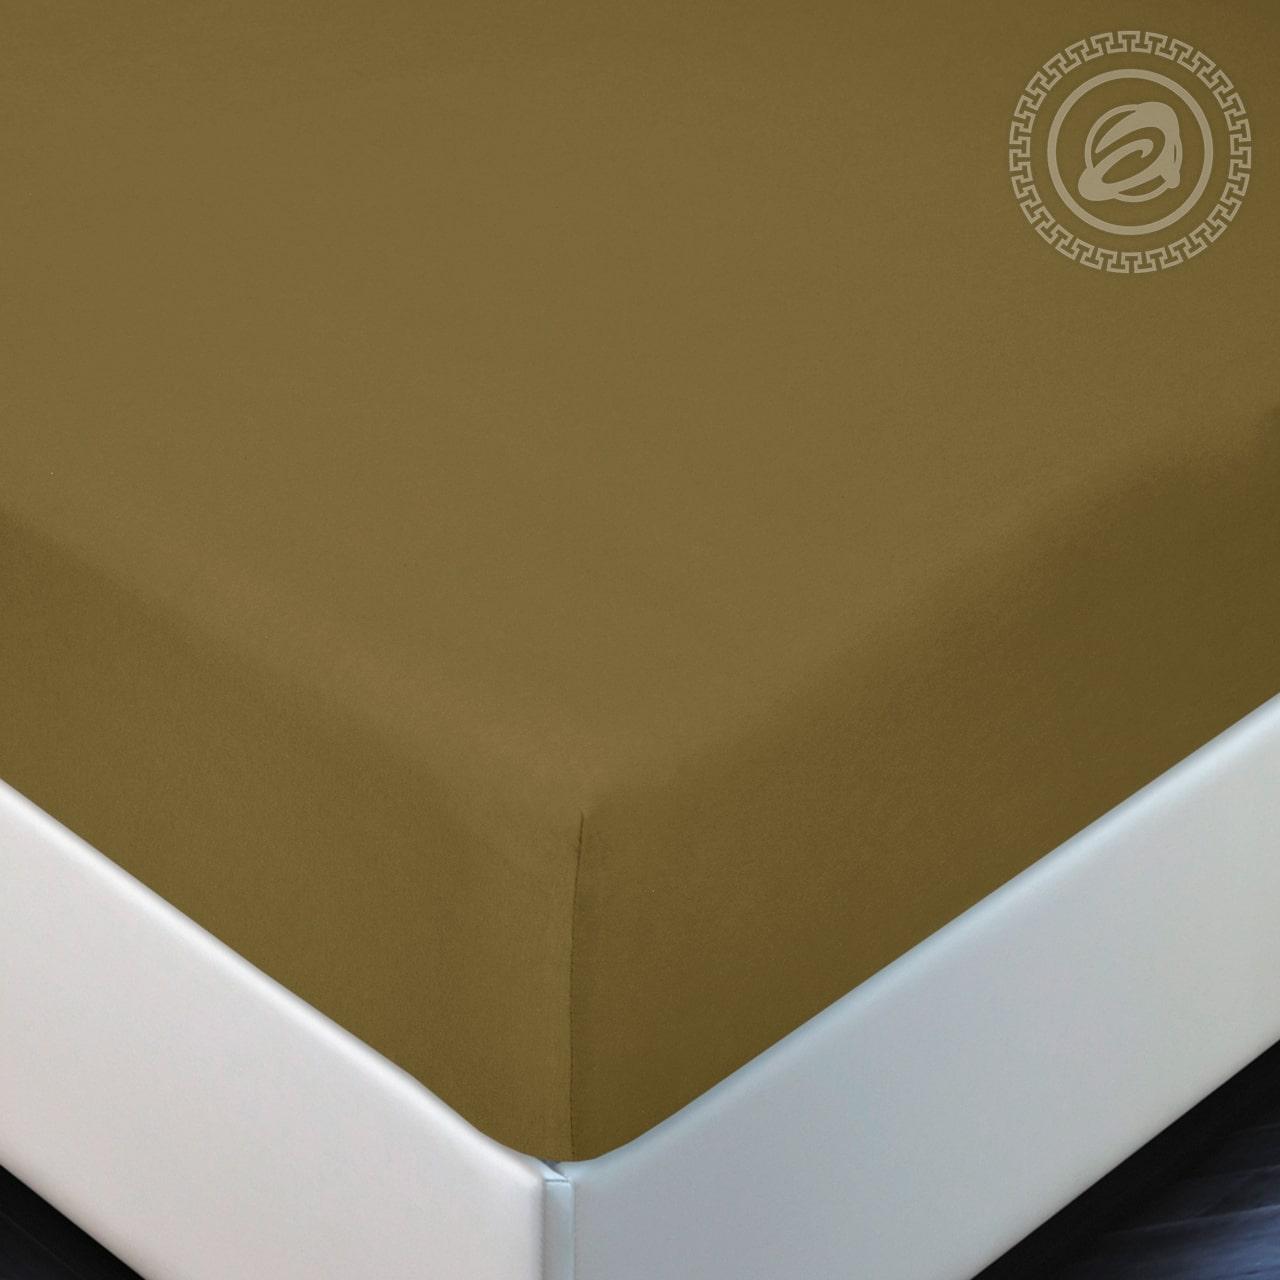 Простыня на резинке iv61948 (трикотаж) 60х120